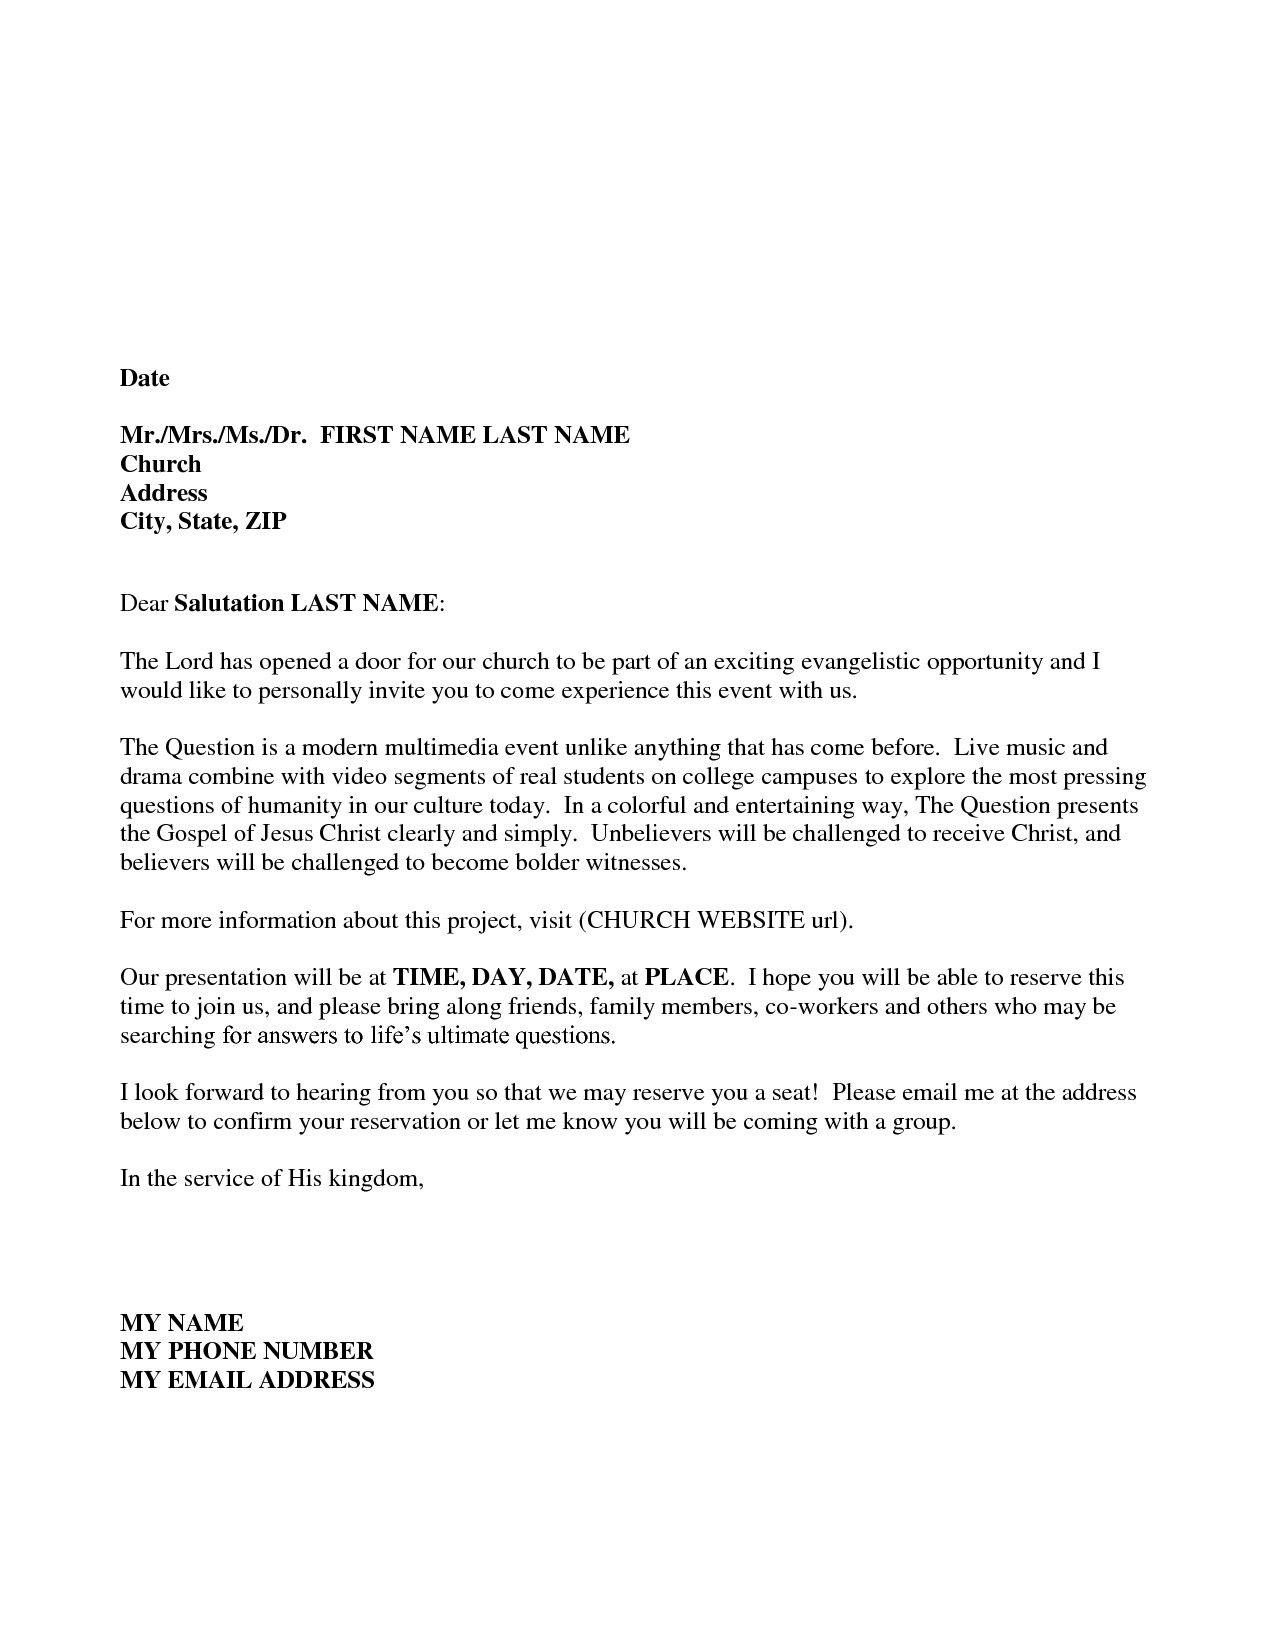 Sample Invitation Letter For A Seminar Save Formal